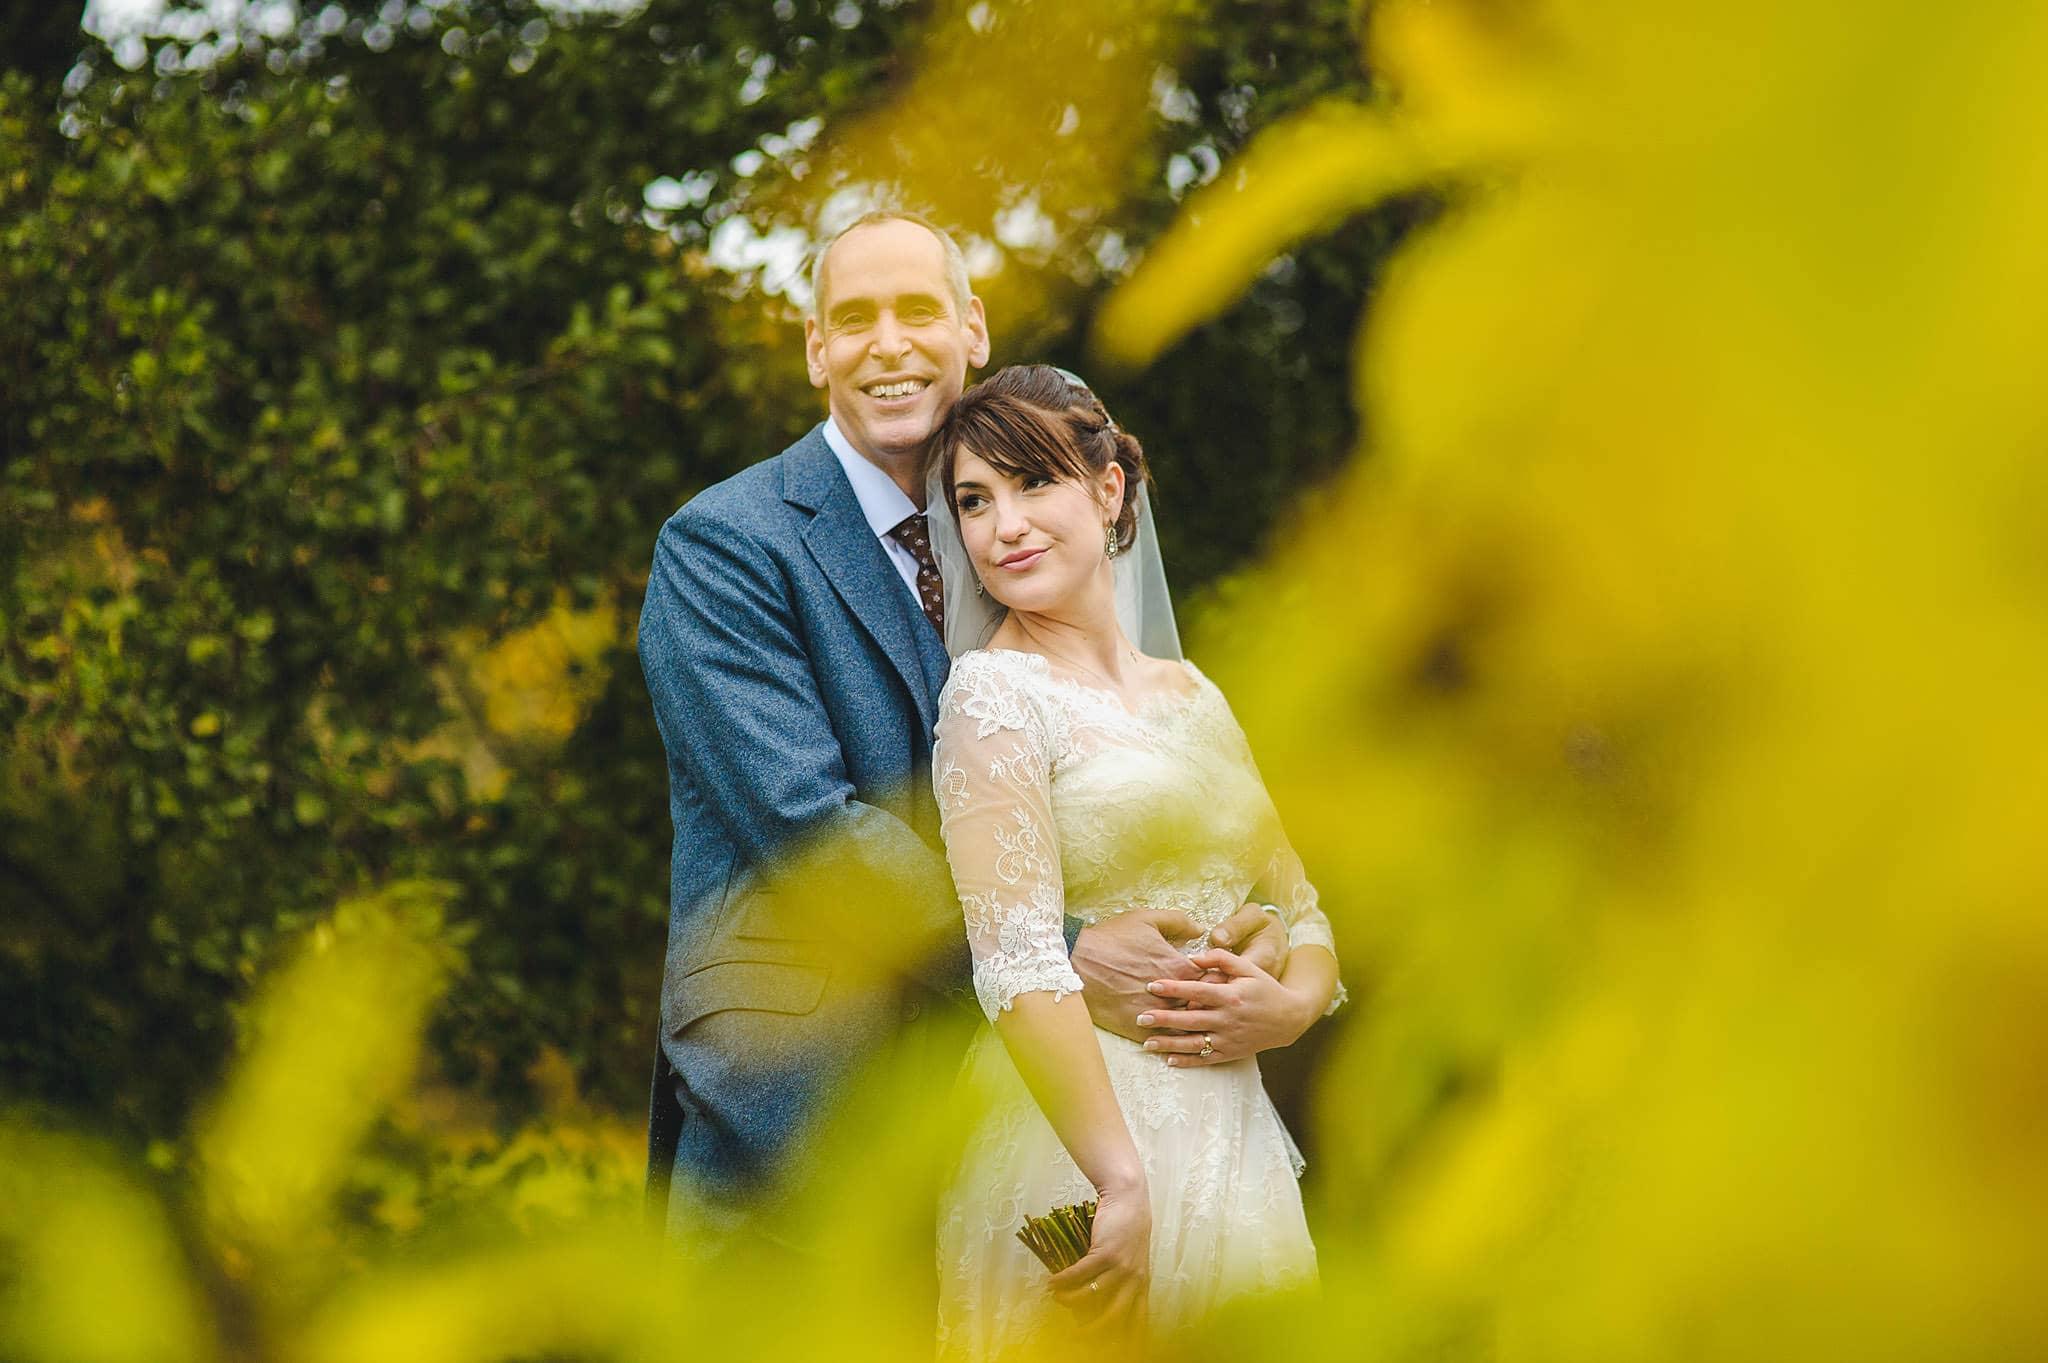 Dewsall Court wedding photography Herefordshire | Laura + Alex 83